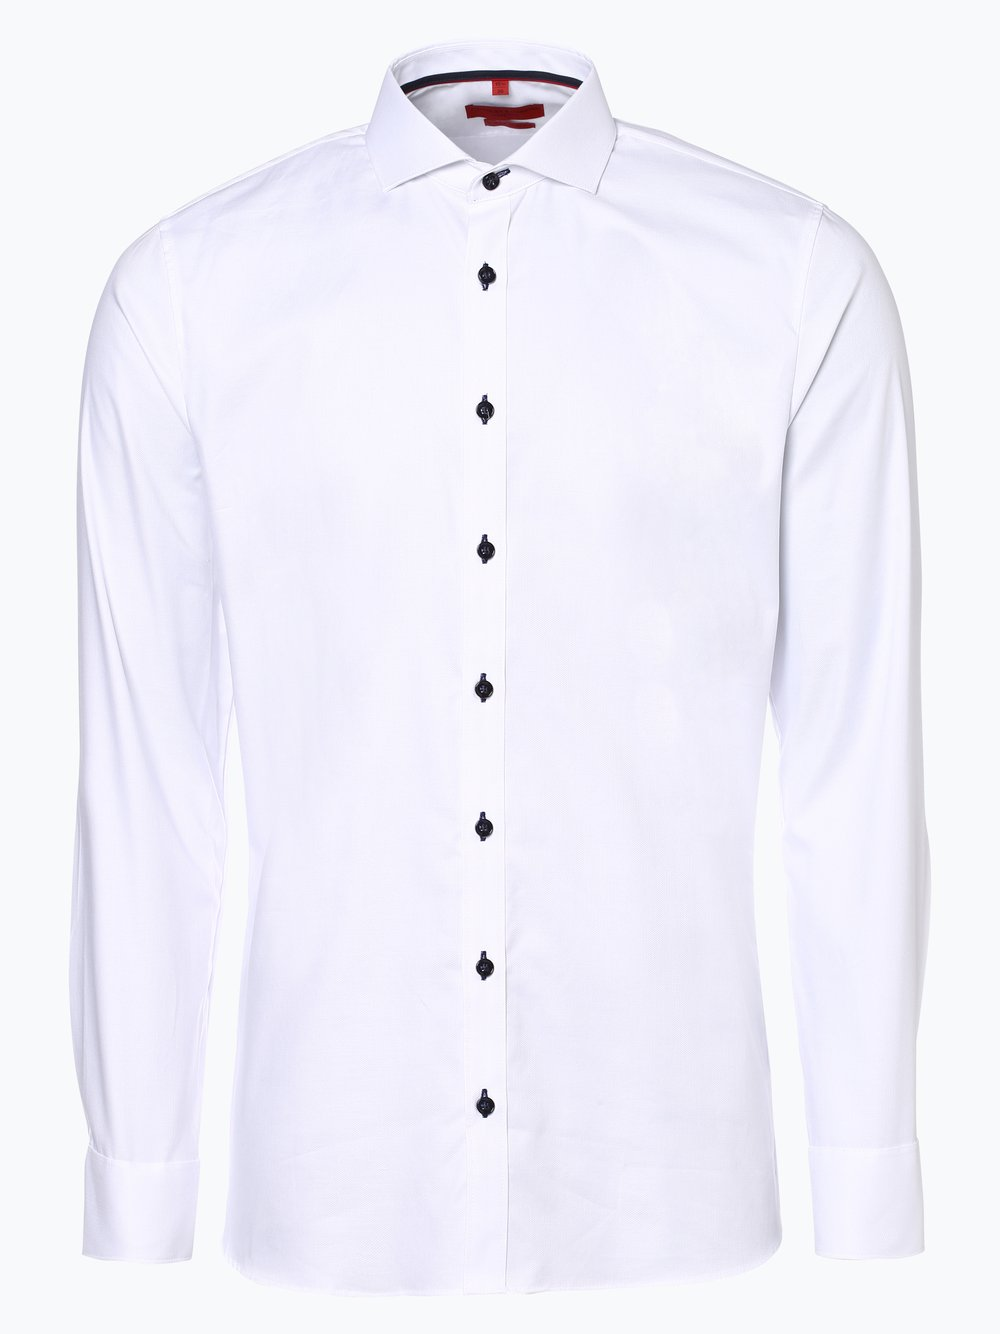 eda6b53288eb Finshley   Harding Herren Hemd weiß gemustert online kaufen   PEEK ...